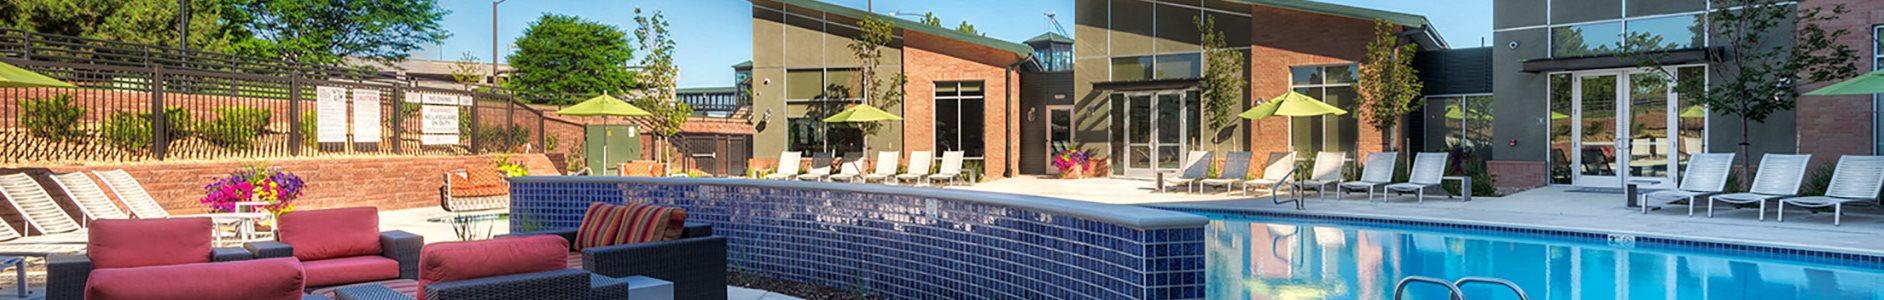 capstone at vallagio apartments in englewood co reviews capstone at vallagio apartments in